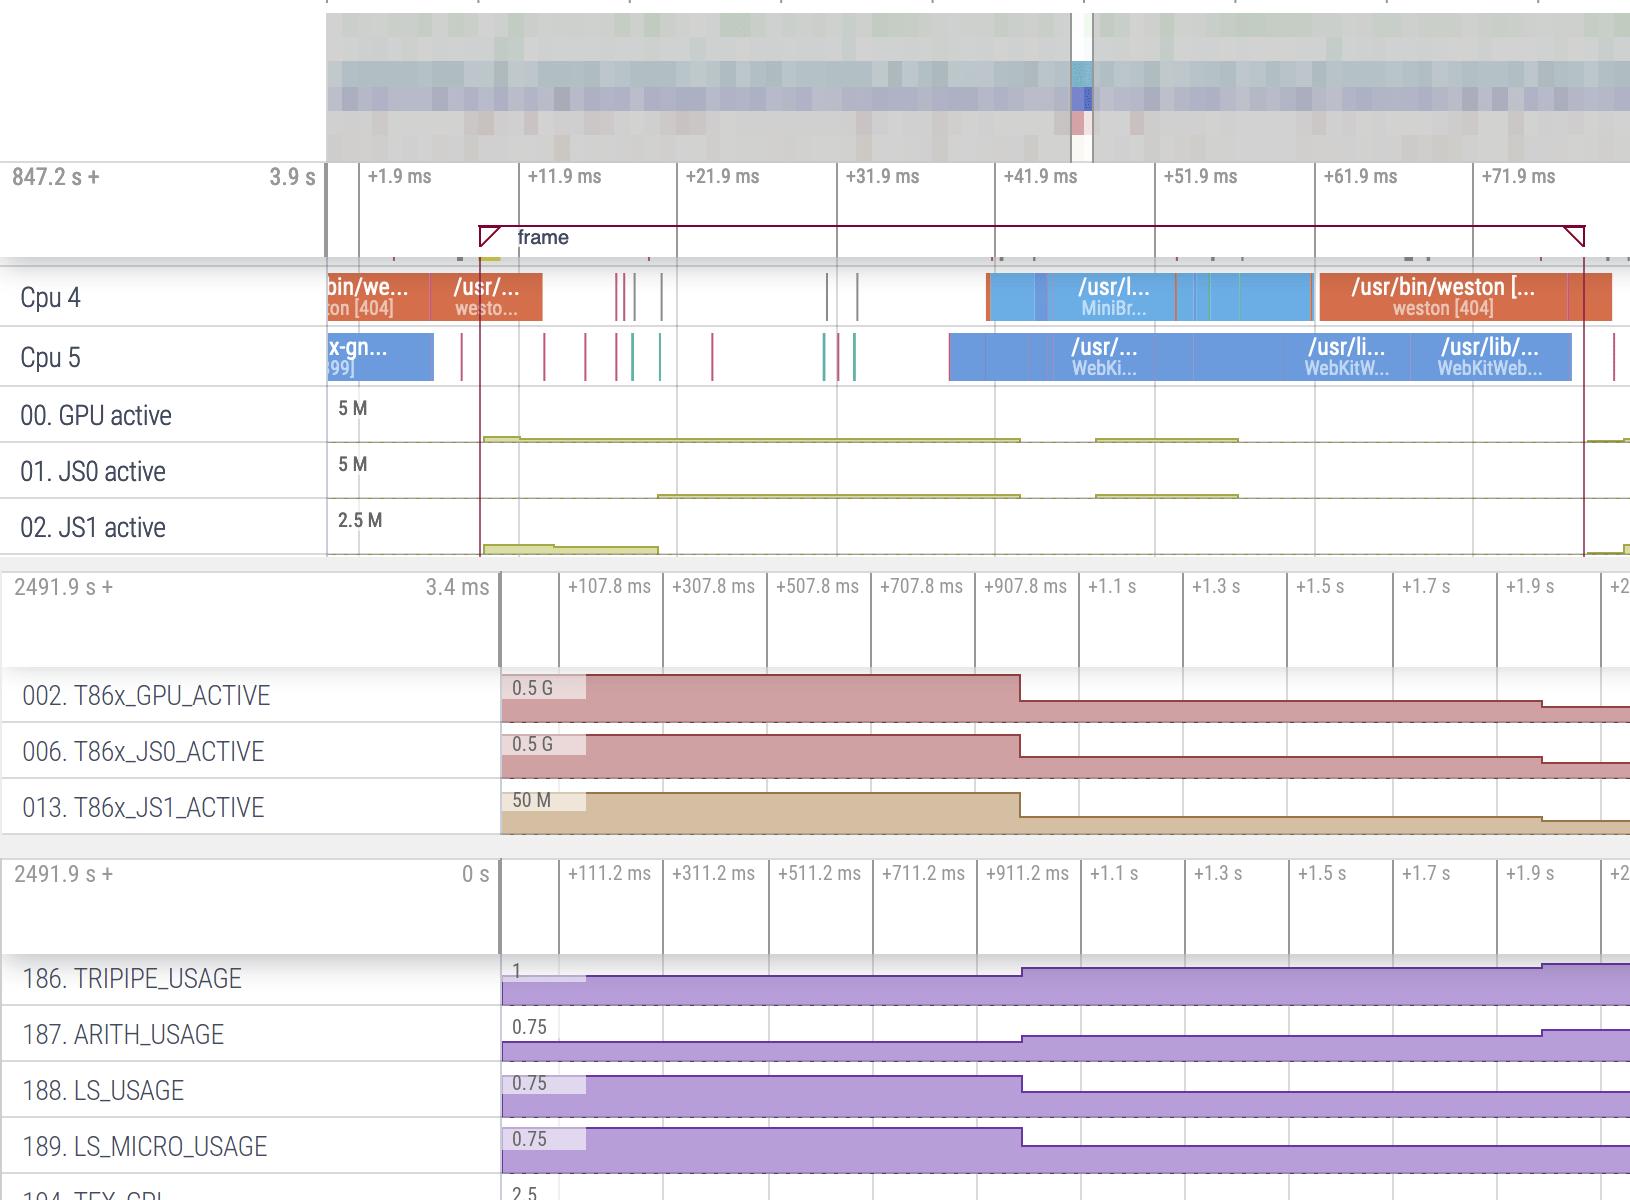 Perfetto Mali GPU Profiling